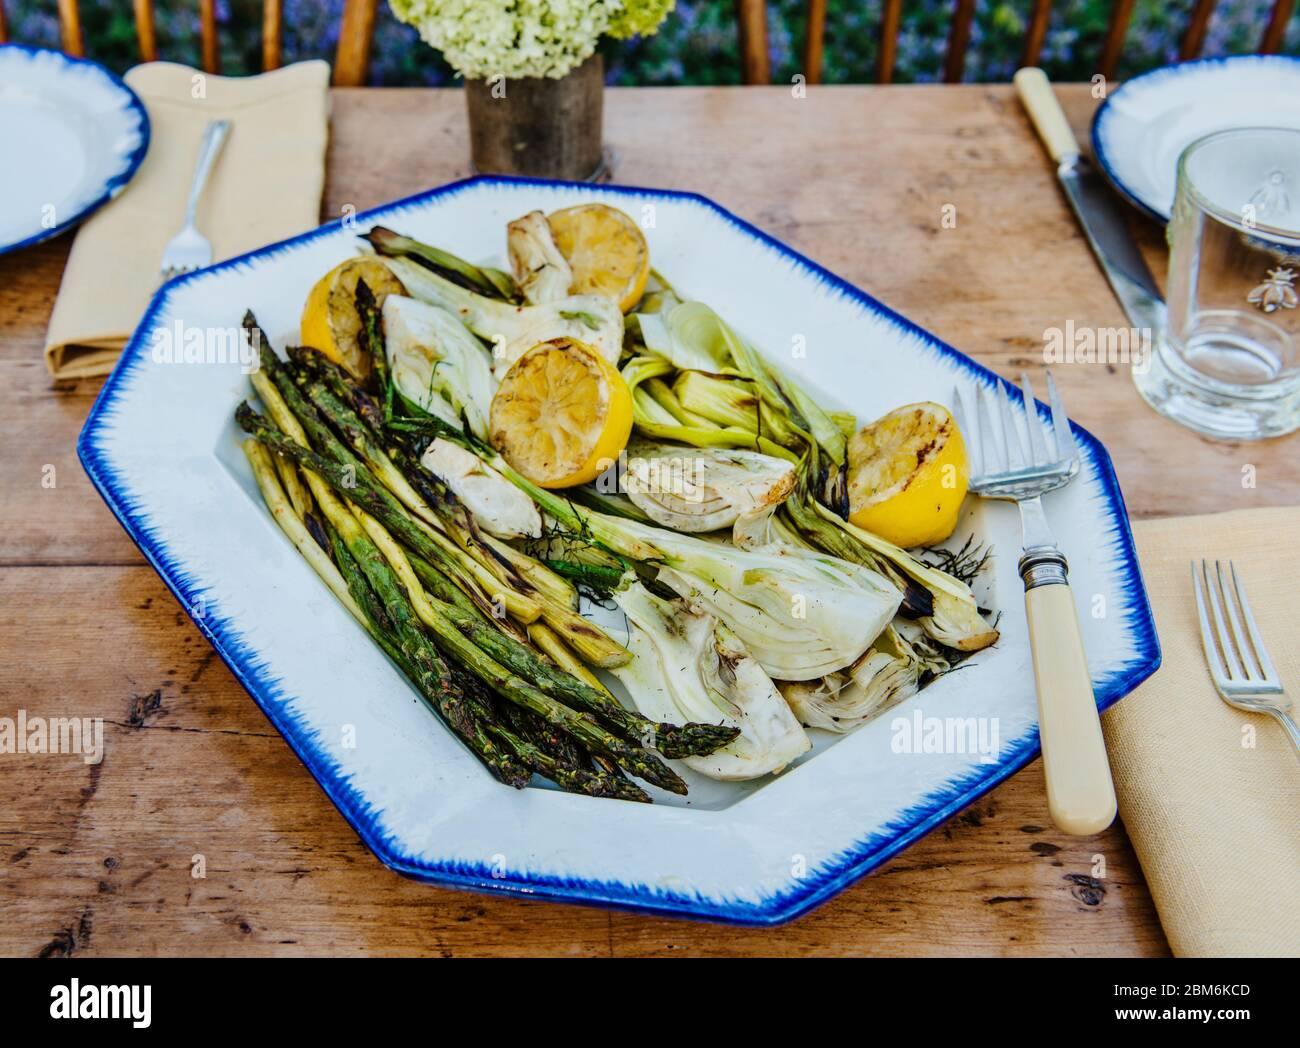 Grilled Summer vegetables of asparagus, fennel and lemon Stock Photo